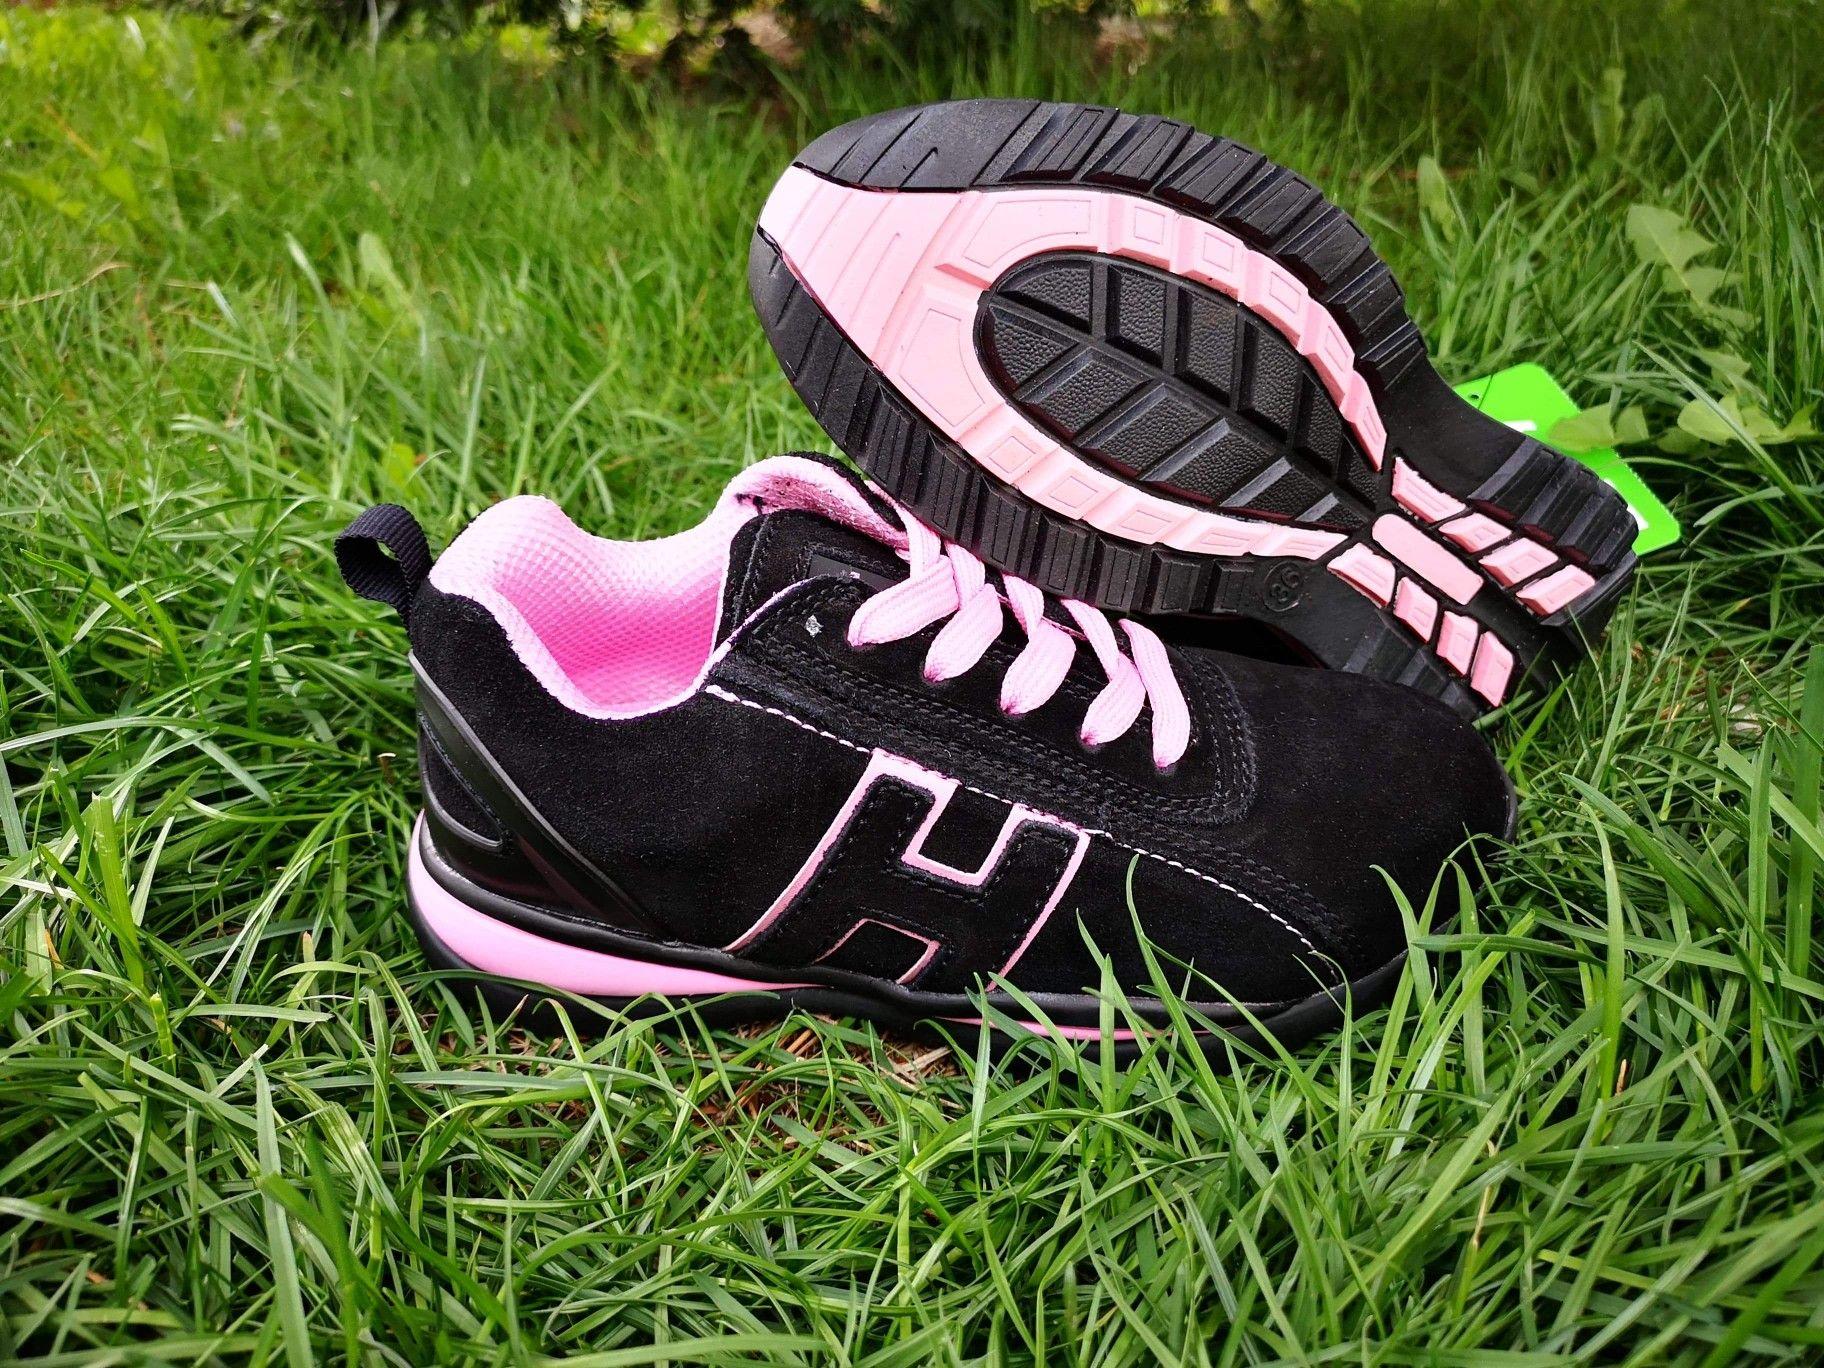 Adidasy Brargentina Ochronne S1 Rozowe Sketchers Sneakers Shoes Sneakers